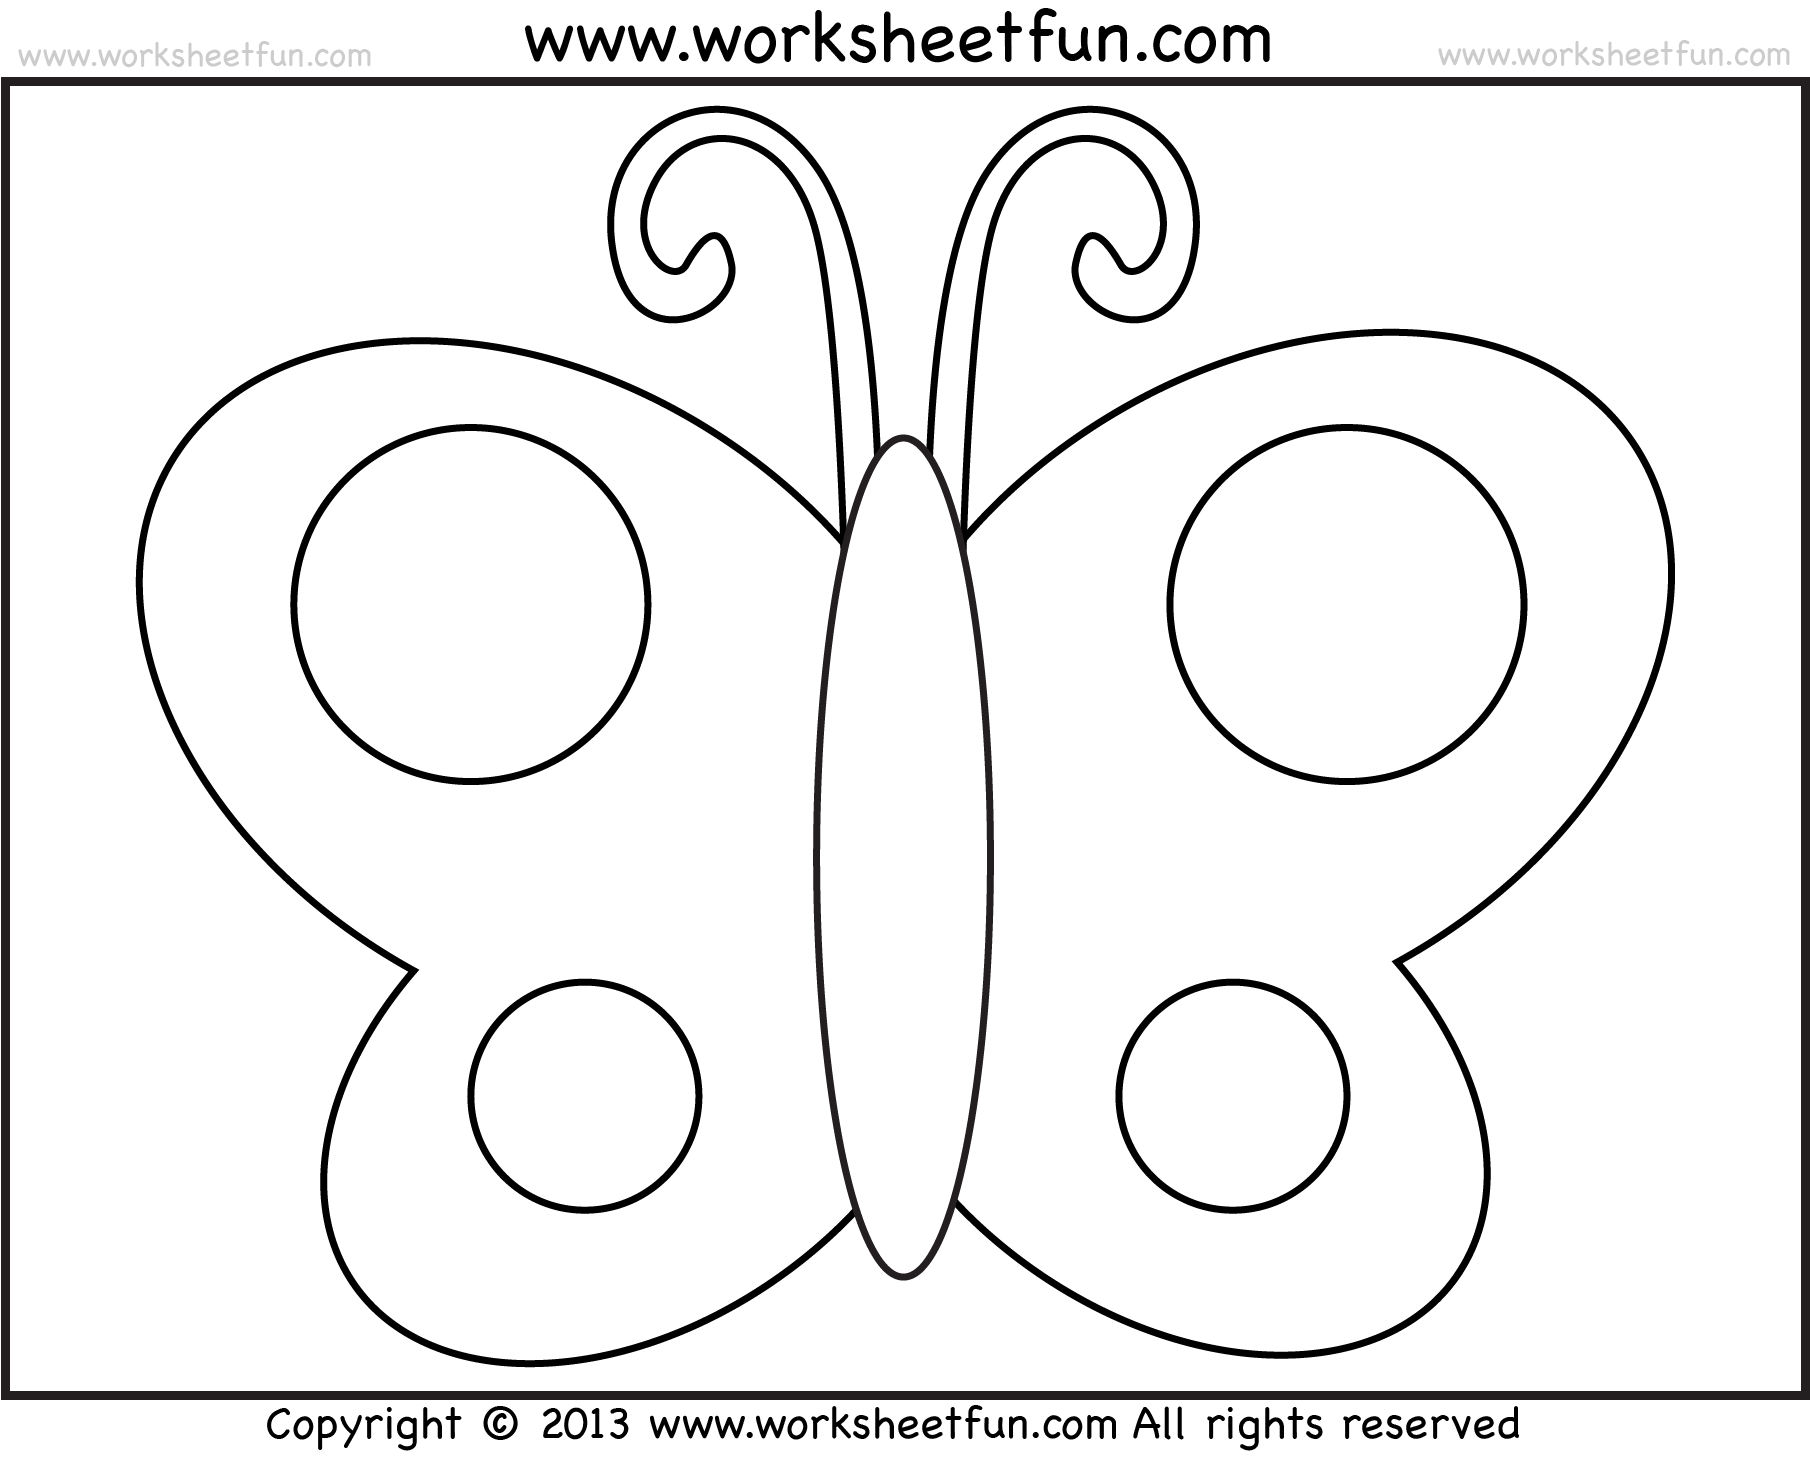 1810x1462 Preschool Drawing Worksheets Coloring In Amusing Draw Photo